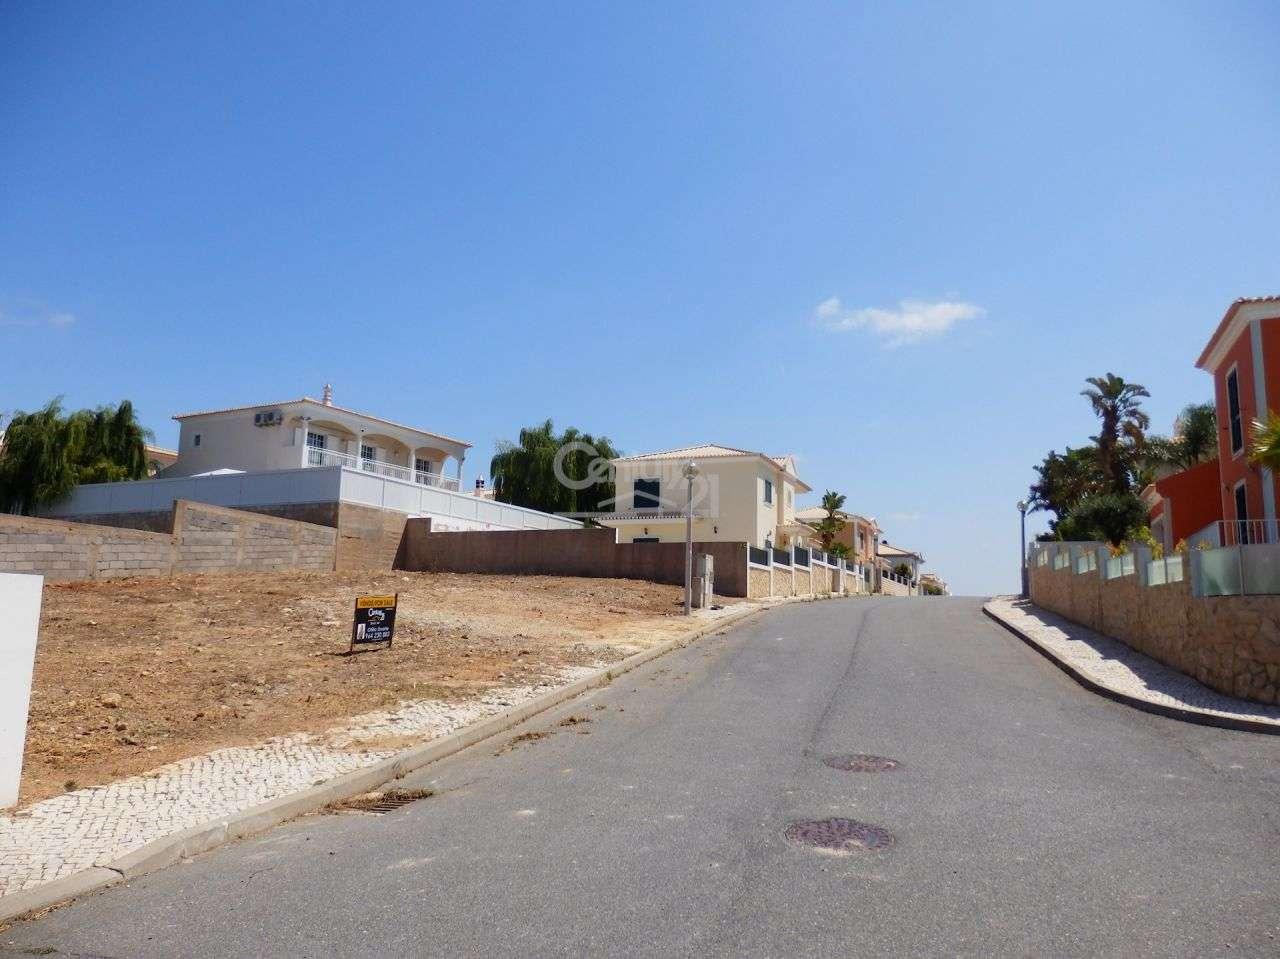 Terreno para comprar, Alcantarilha e Pêra, Silves, Faro - Foto 2